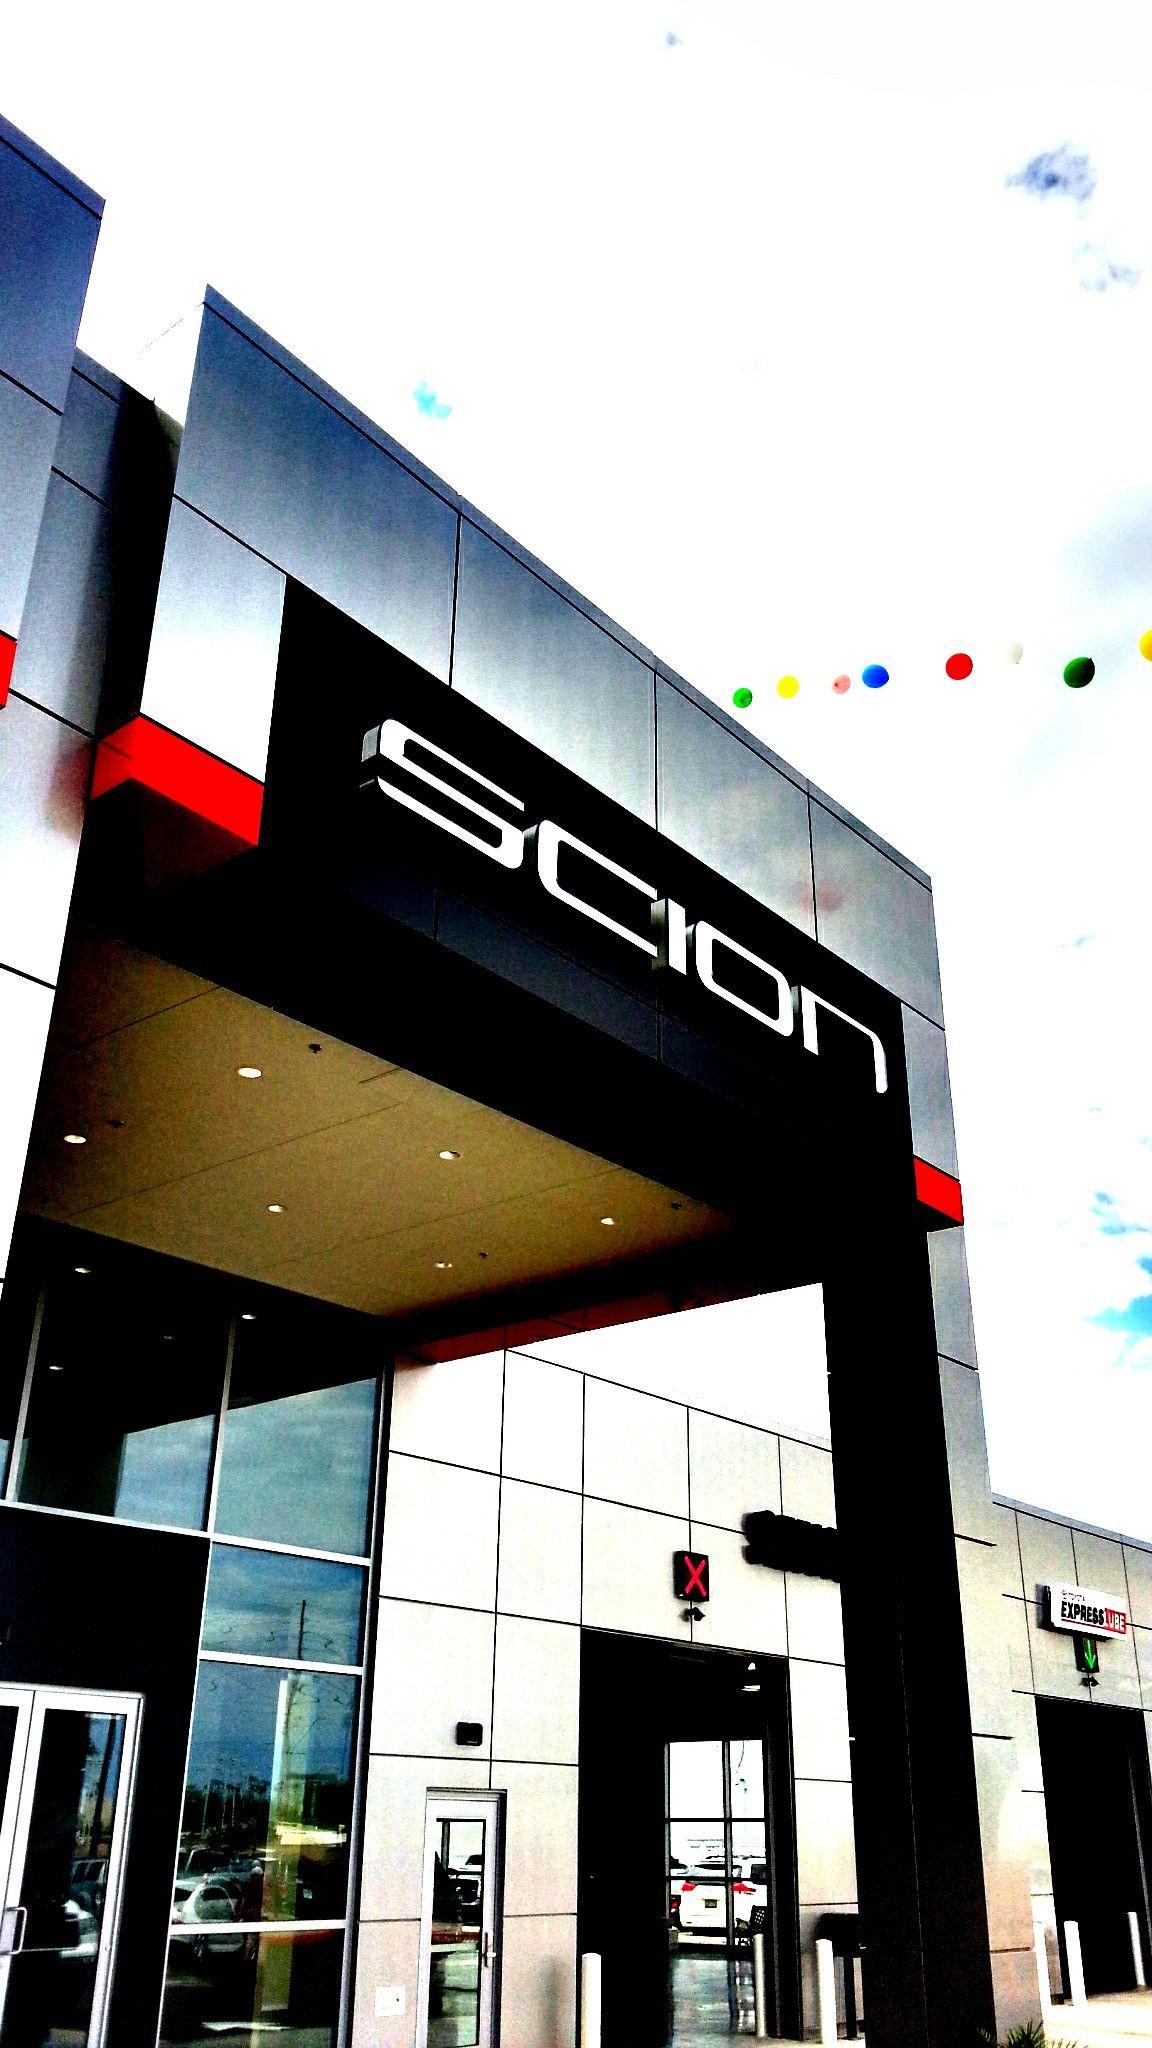 Toyota Scion Peoria Toyota Dealership Peoria Dealership